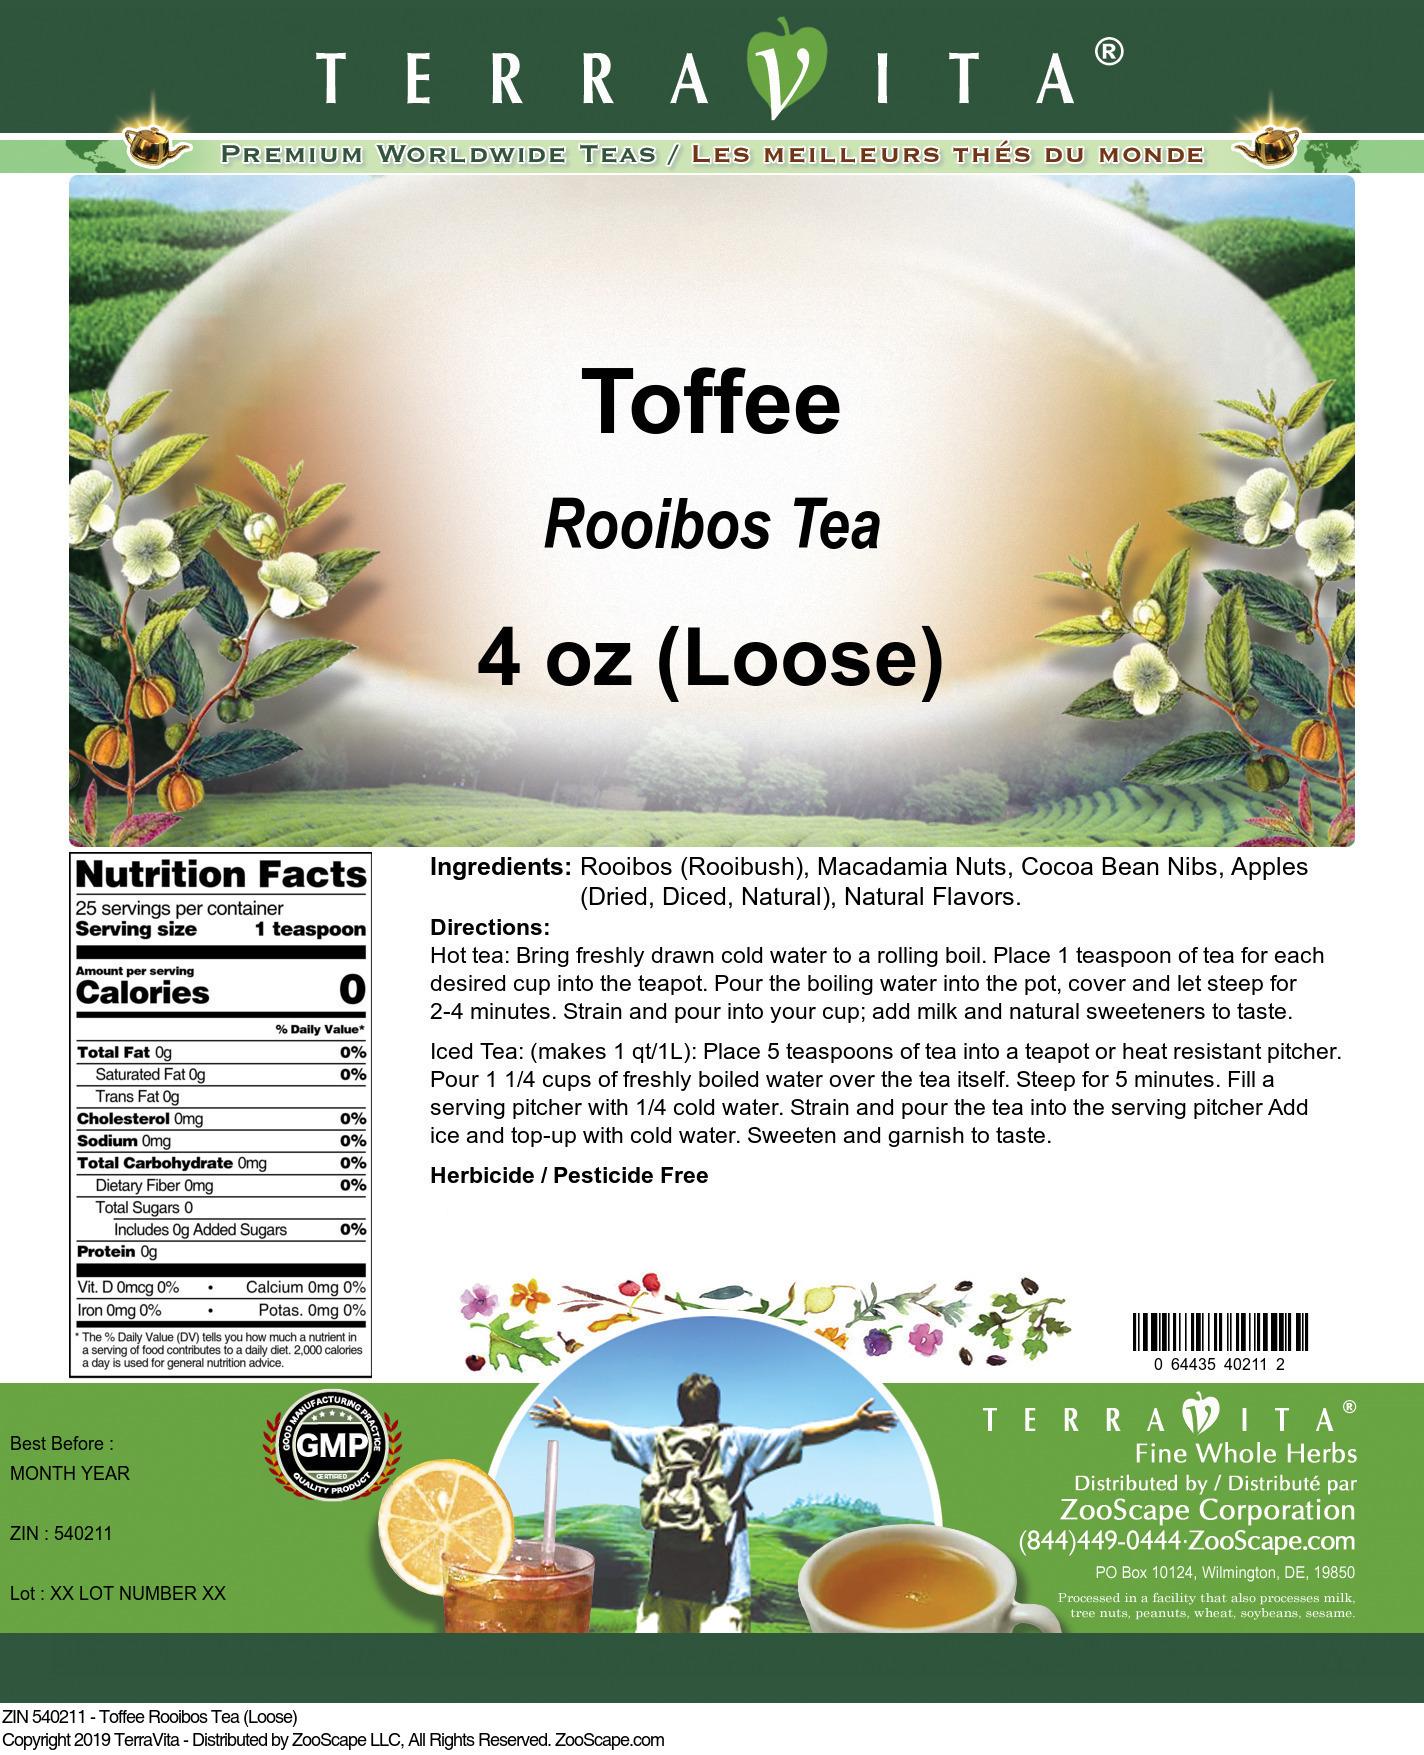 Toffee Rooibos Tea (Loose)